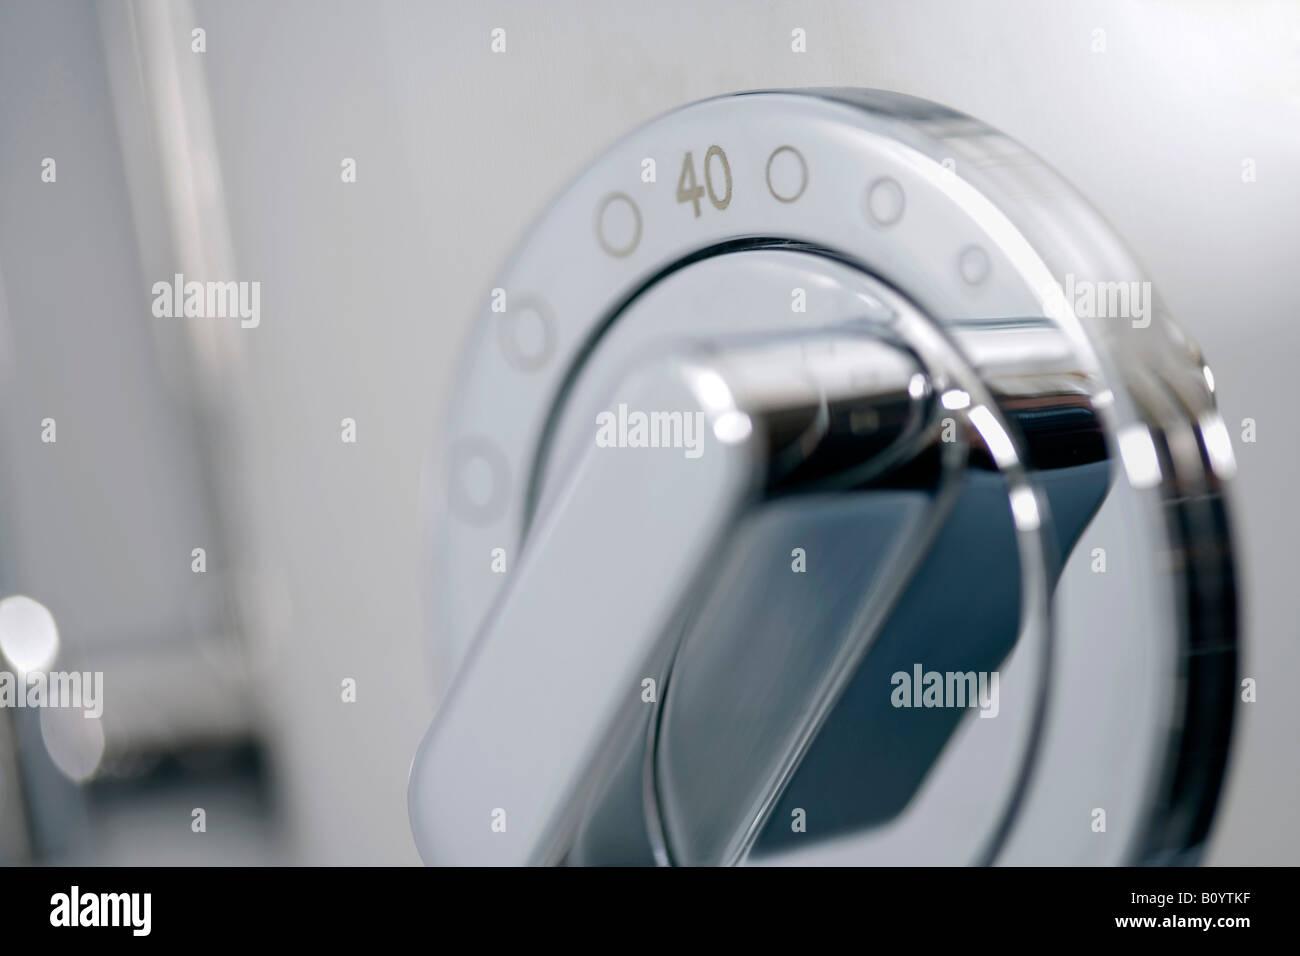 Dial, close-up - Stock Image